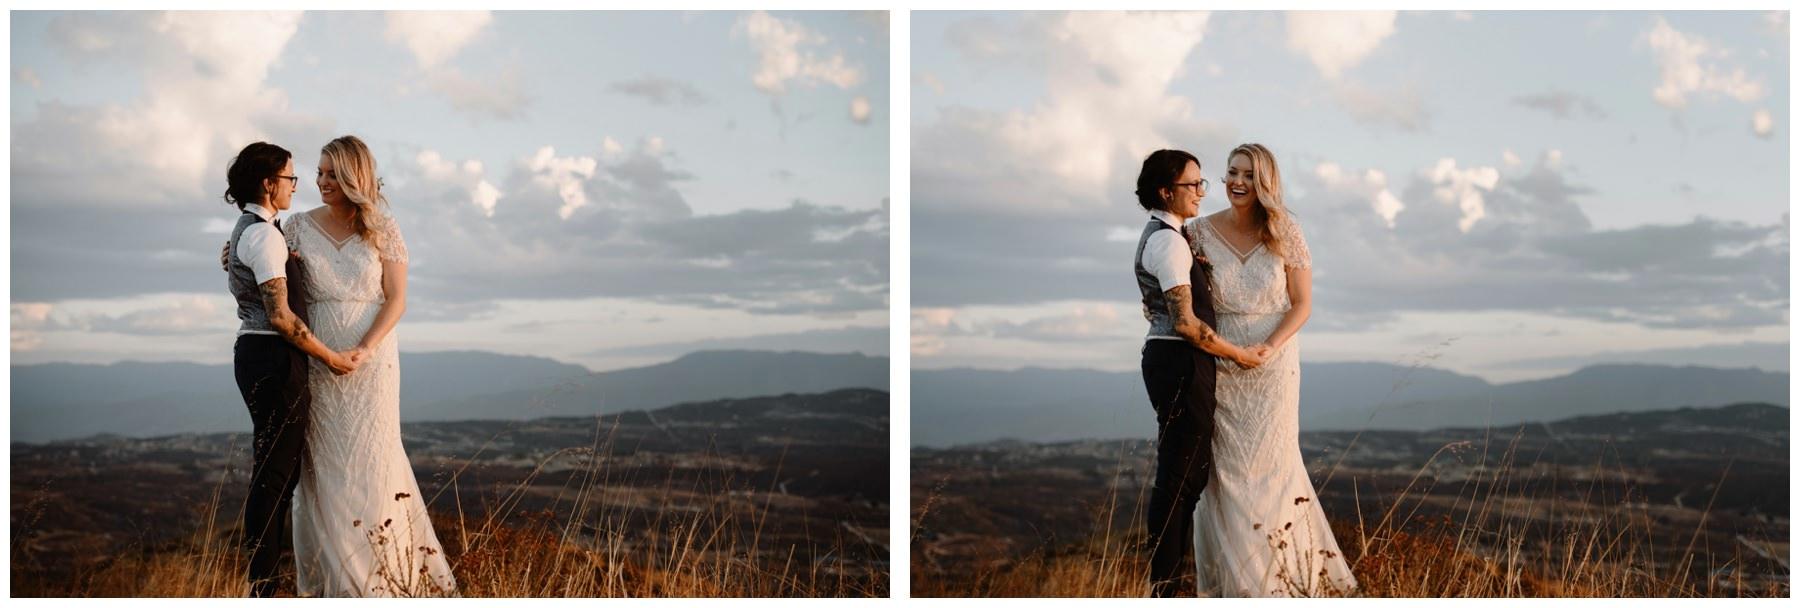 Temecula_Wedding_photographers_Wolf_Feather_Honey_0054.jpg